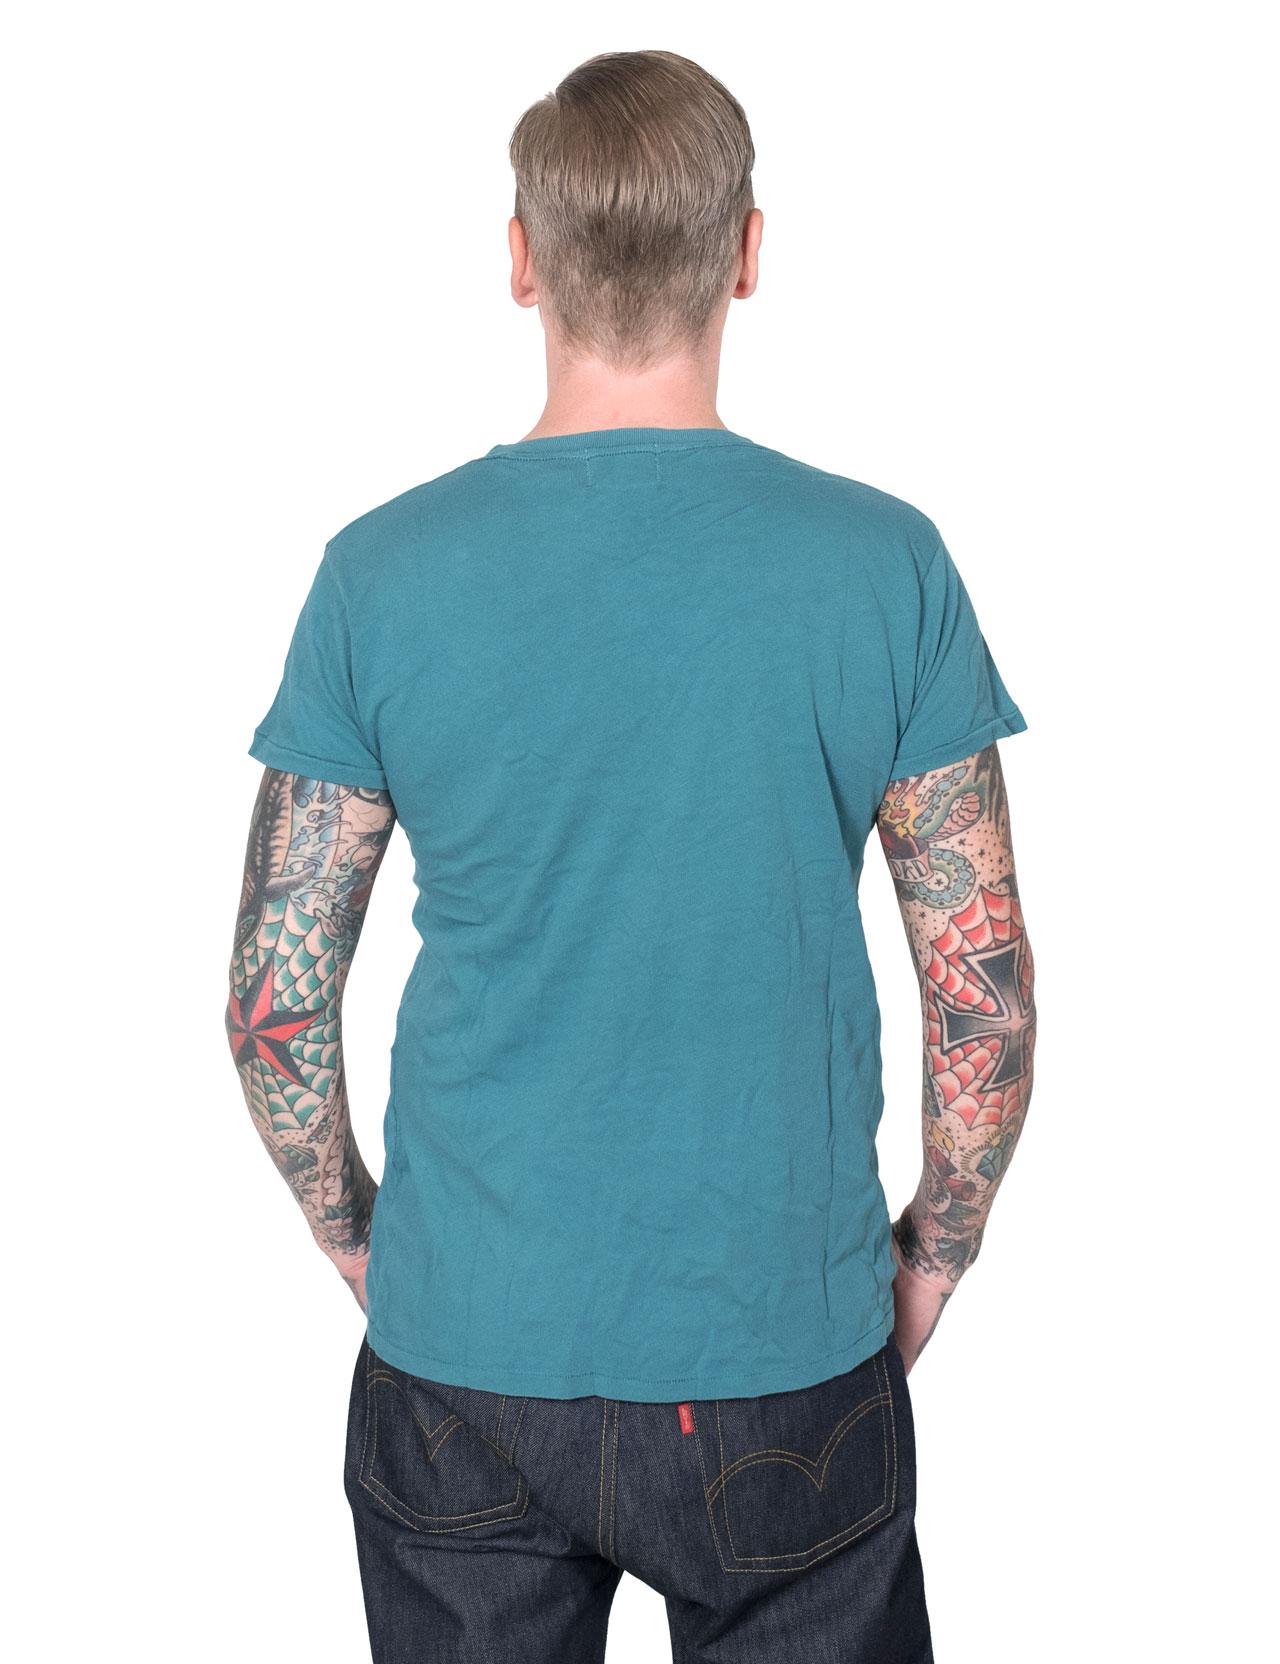 eab01406819 Levi´s Vintage Clothing - 1950´S Sportswear Tee - Tapestry Blue